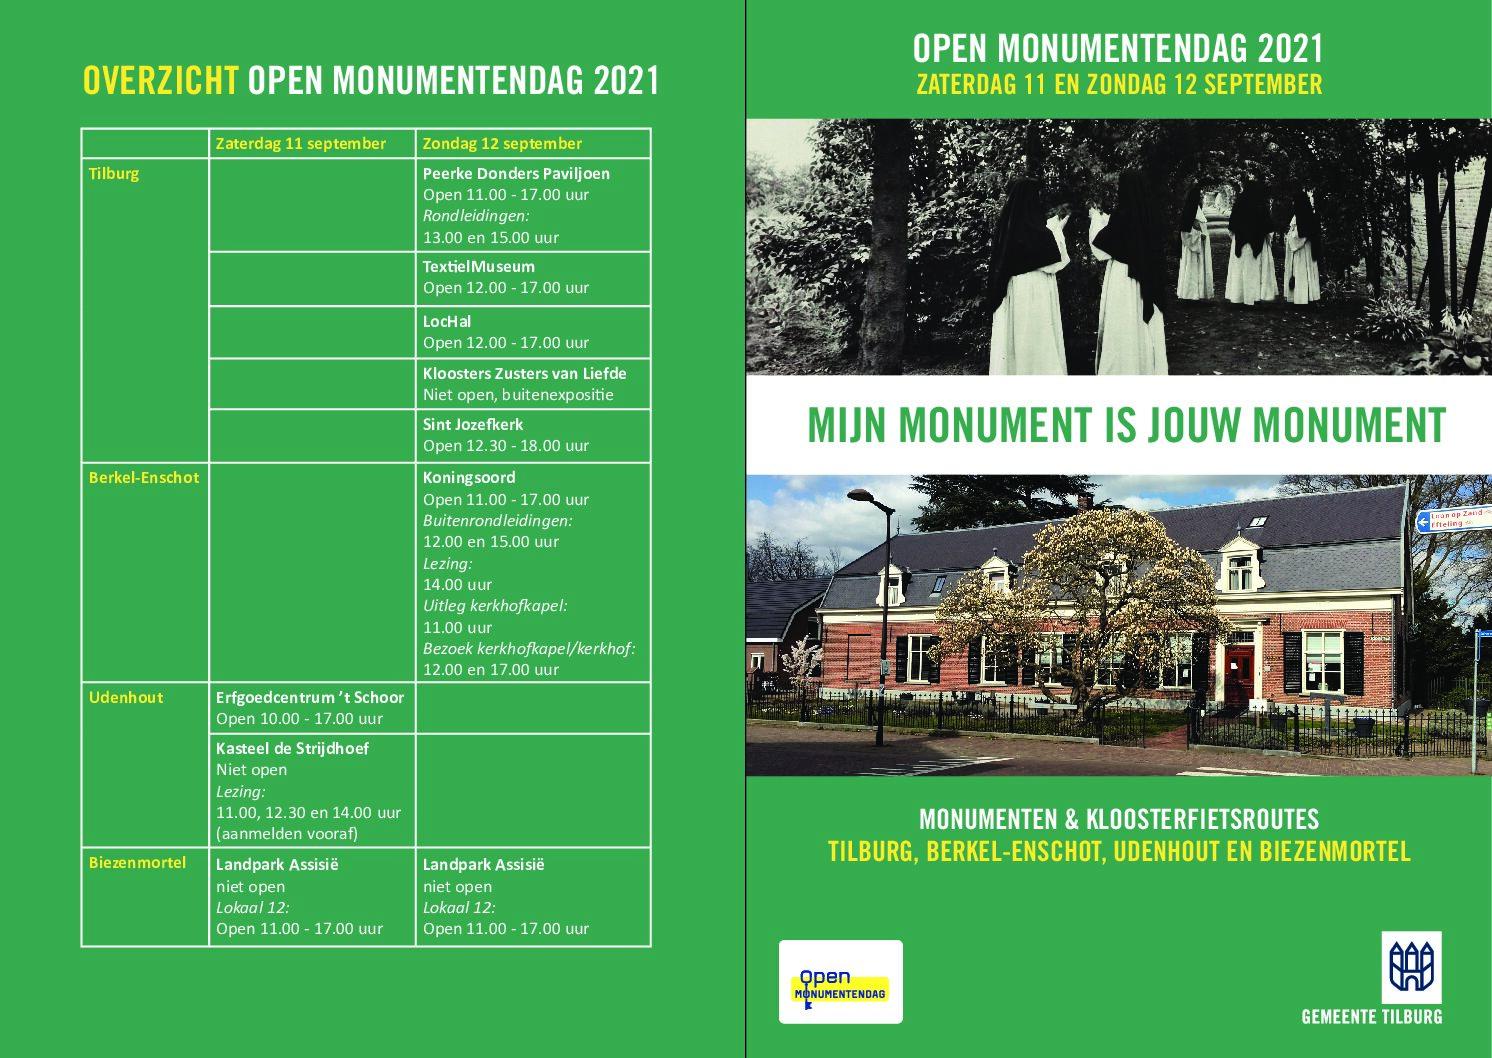 Monumenten & Kloosterfietsroutes